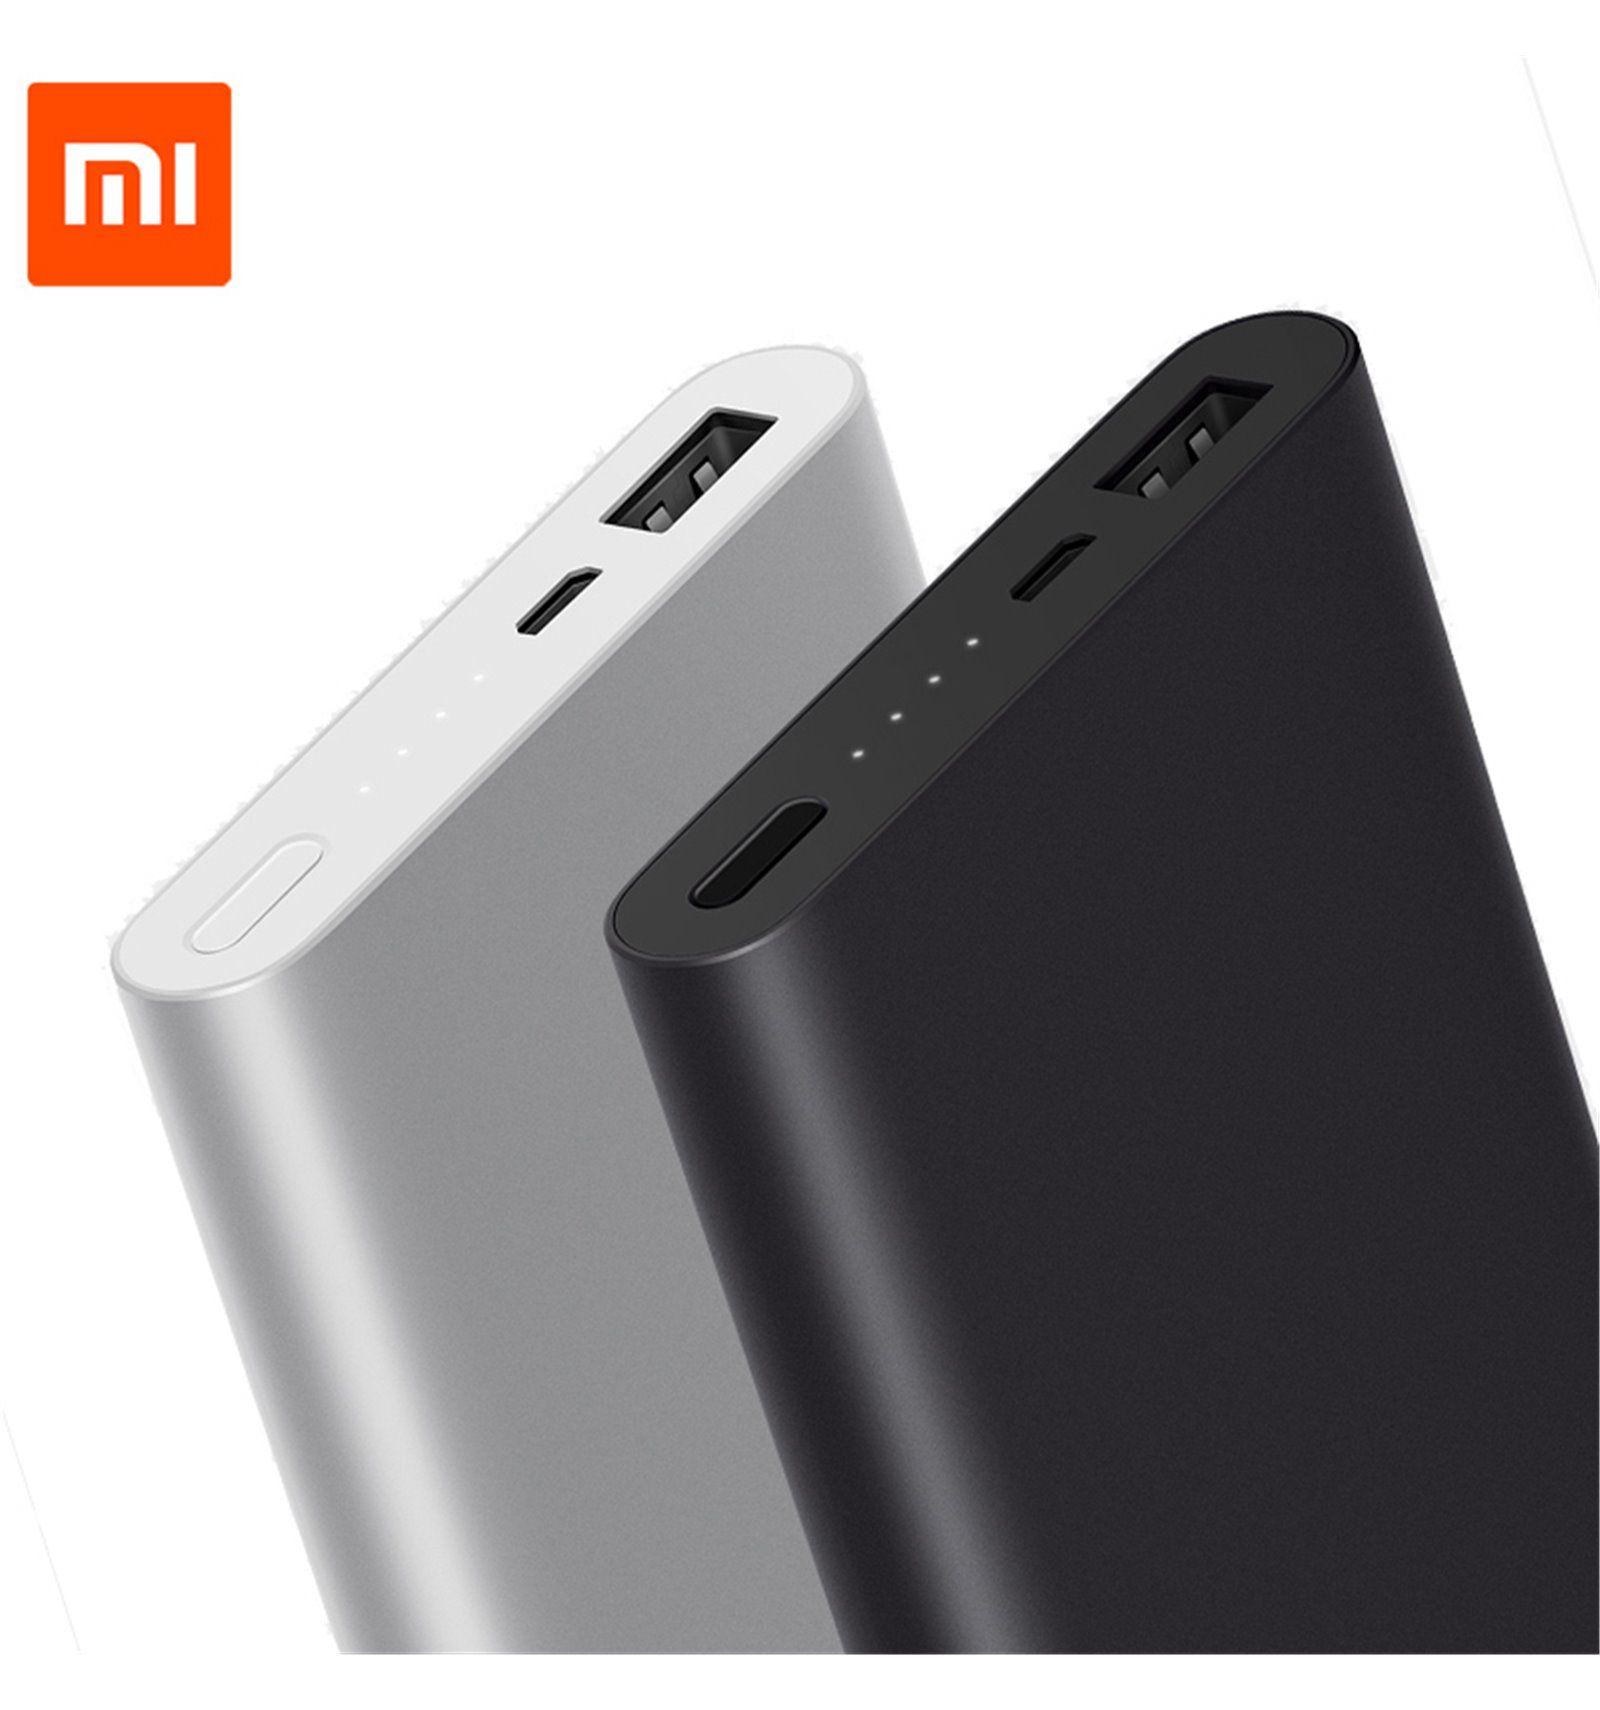 Xiaomi 10000mAh Powerbank 2 - Slim für 11,68€ inkl. Versand